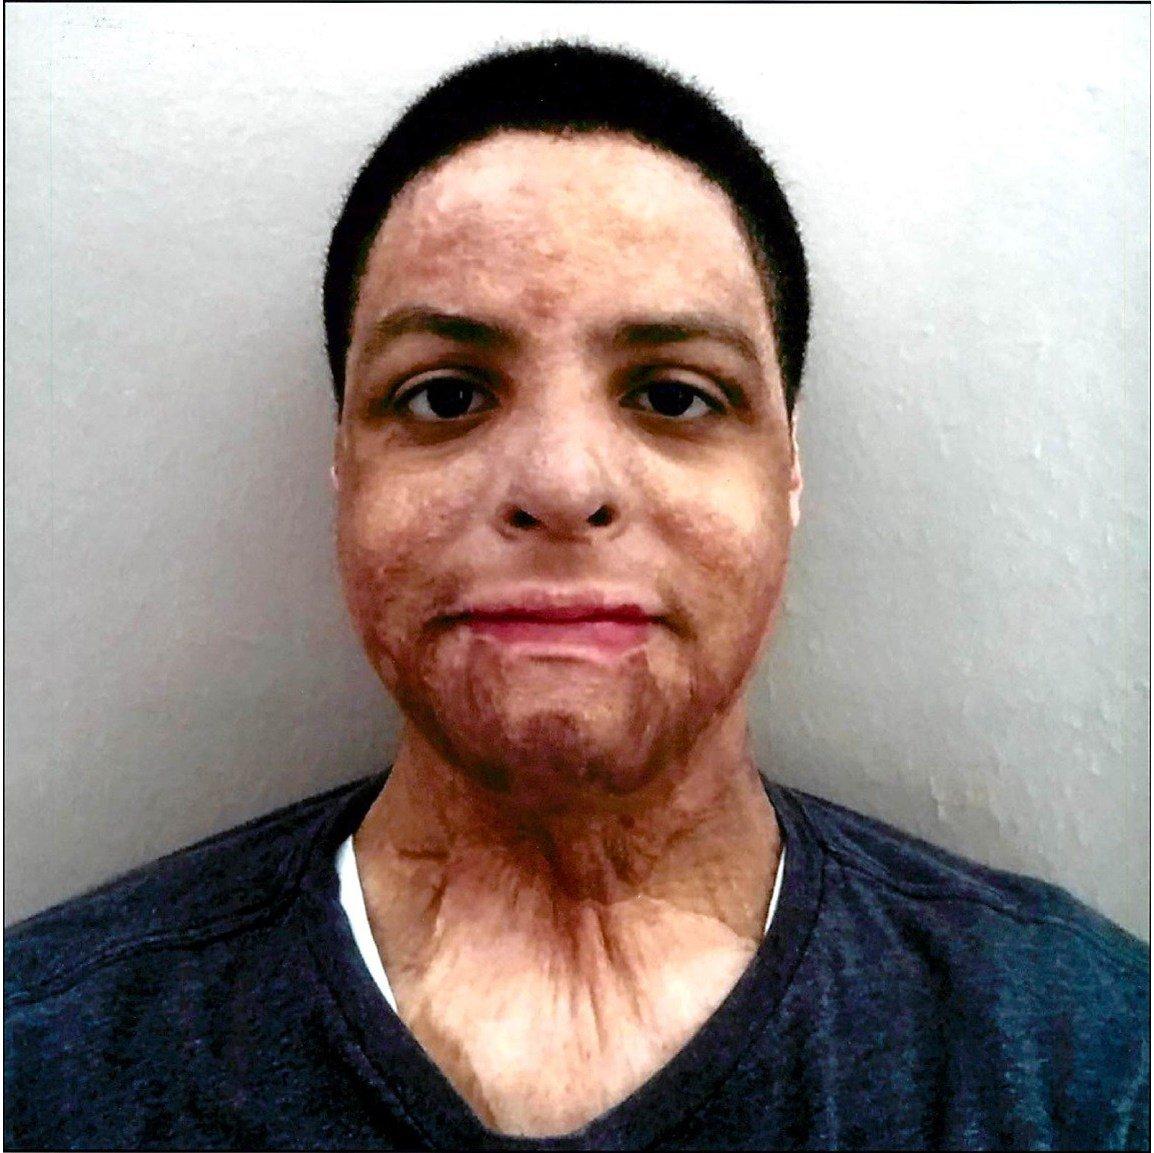 Burn Injury victim Alonzo Yanes